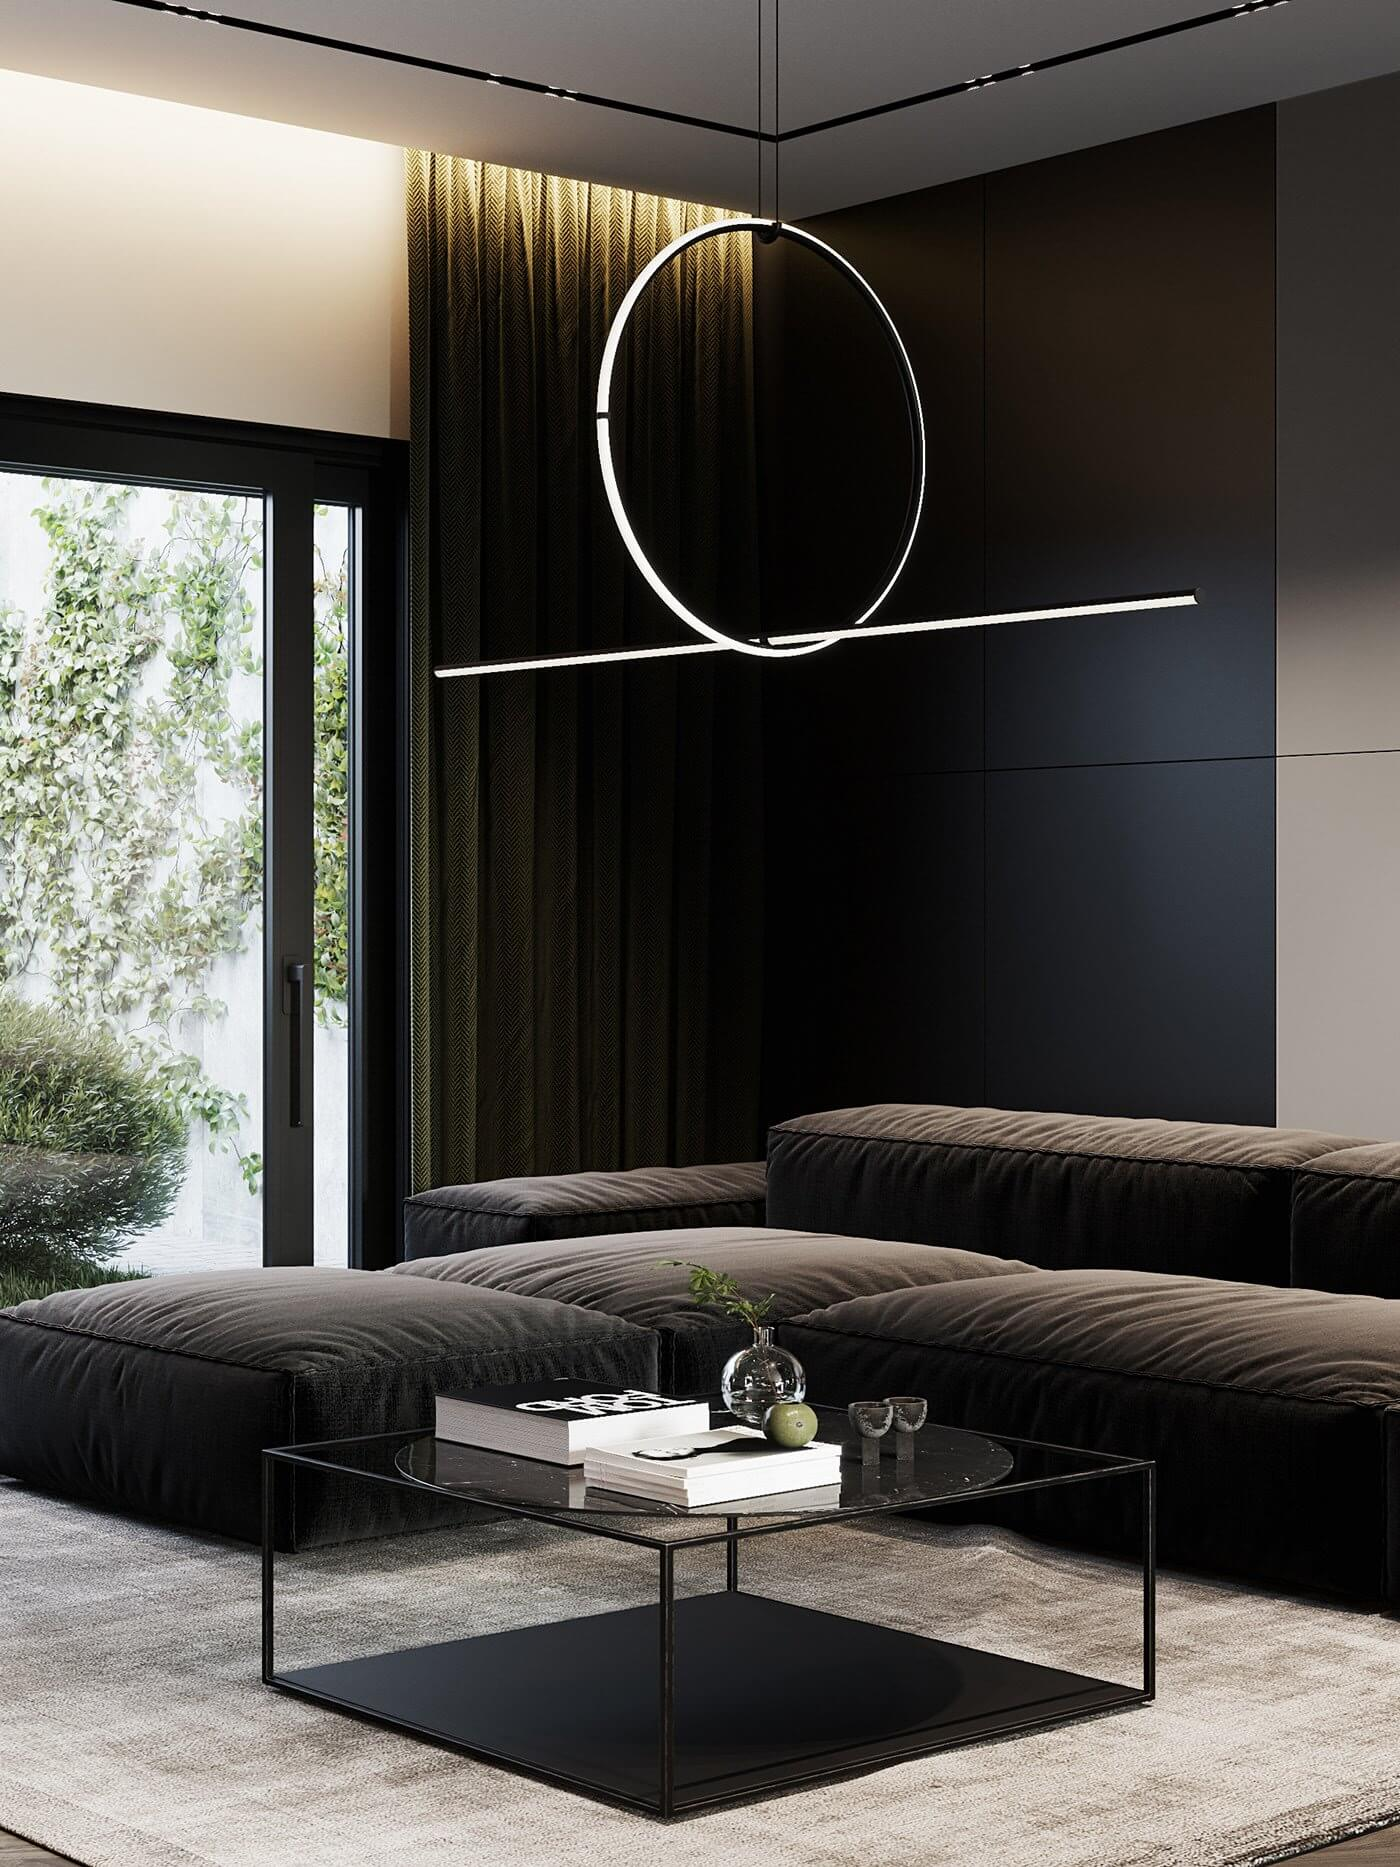 Dark living Apartment living room couch design - cgi visualization